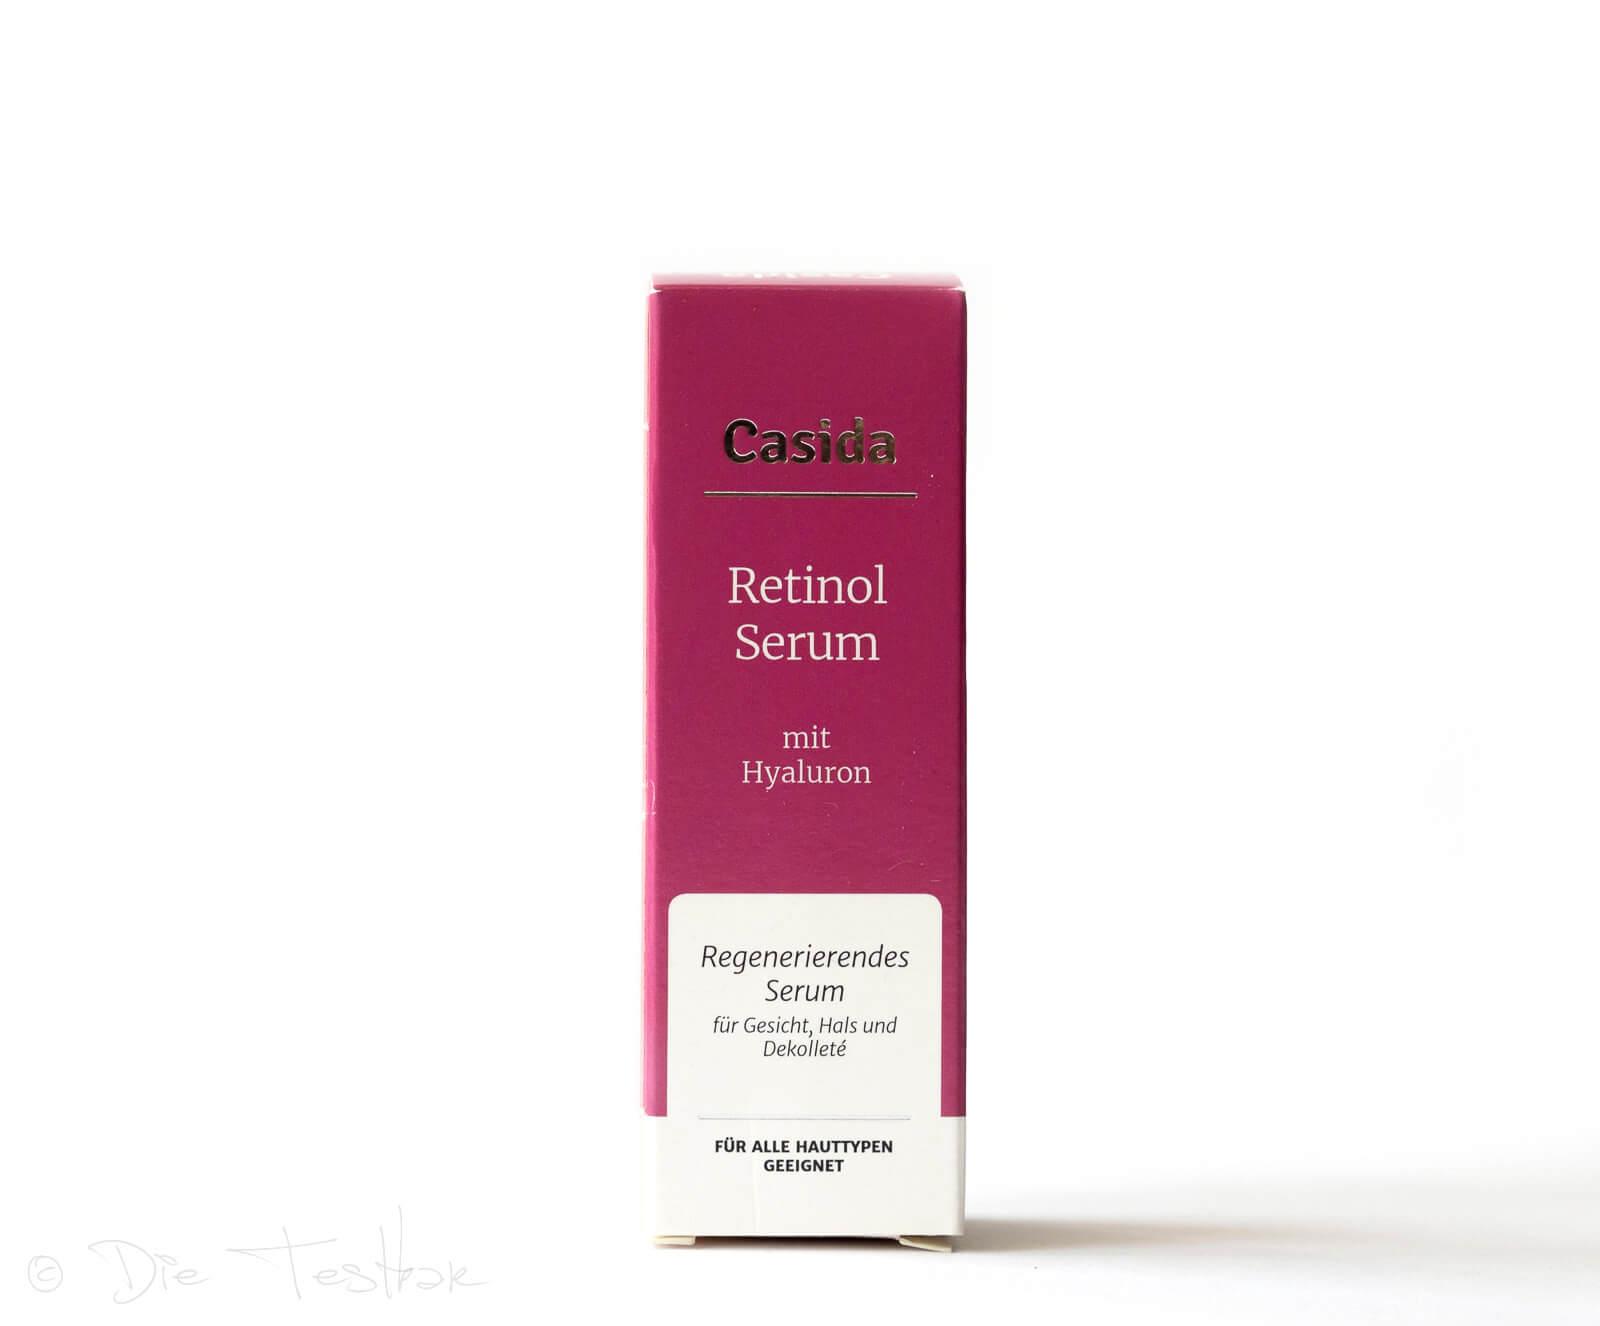 Retinol Serum vom Casida